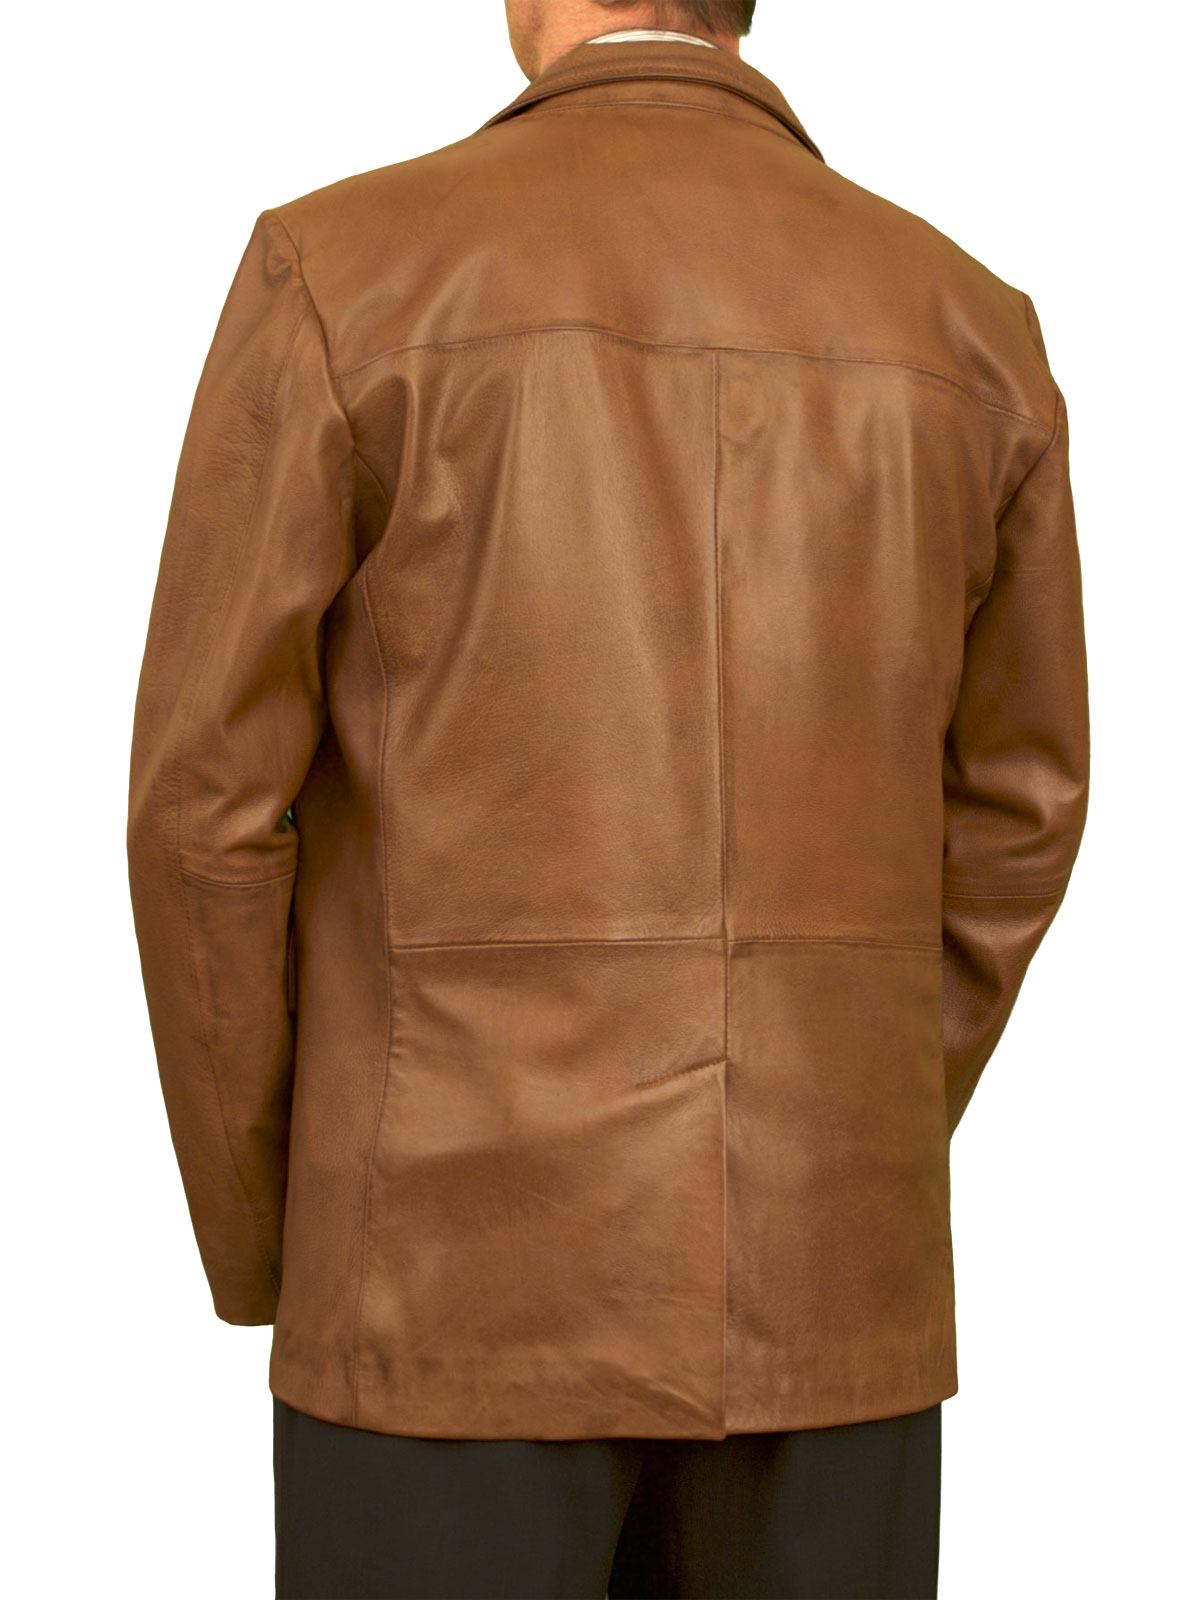 Mens Luxury Leather Blazer Jacket 2 Button 5 Colours